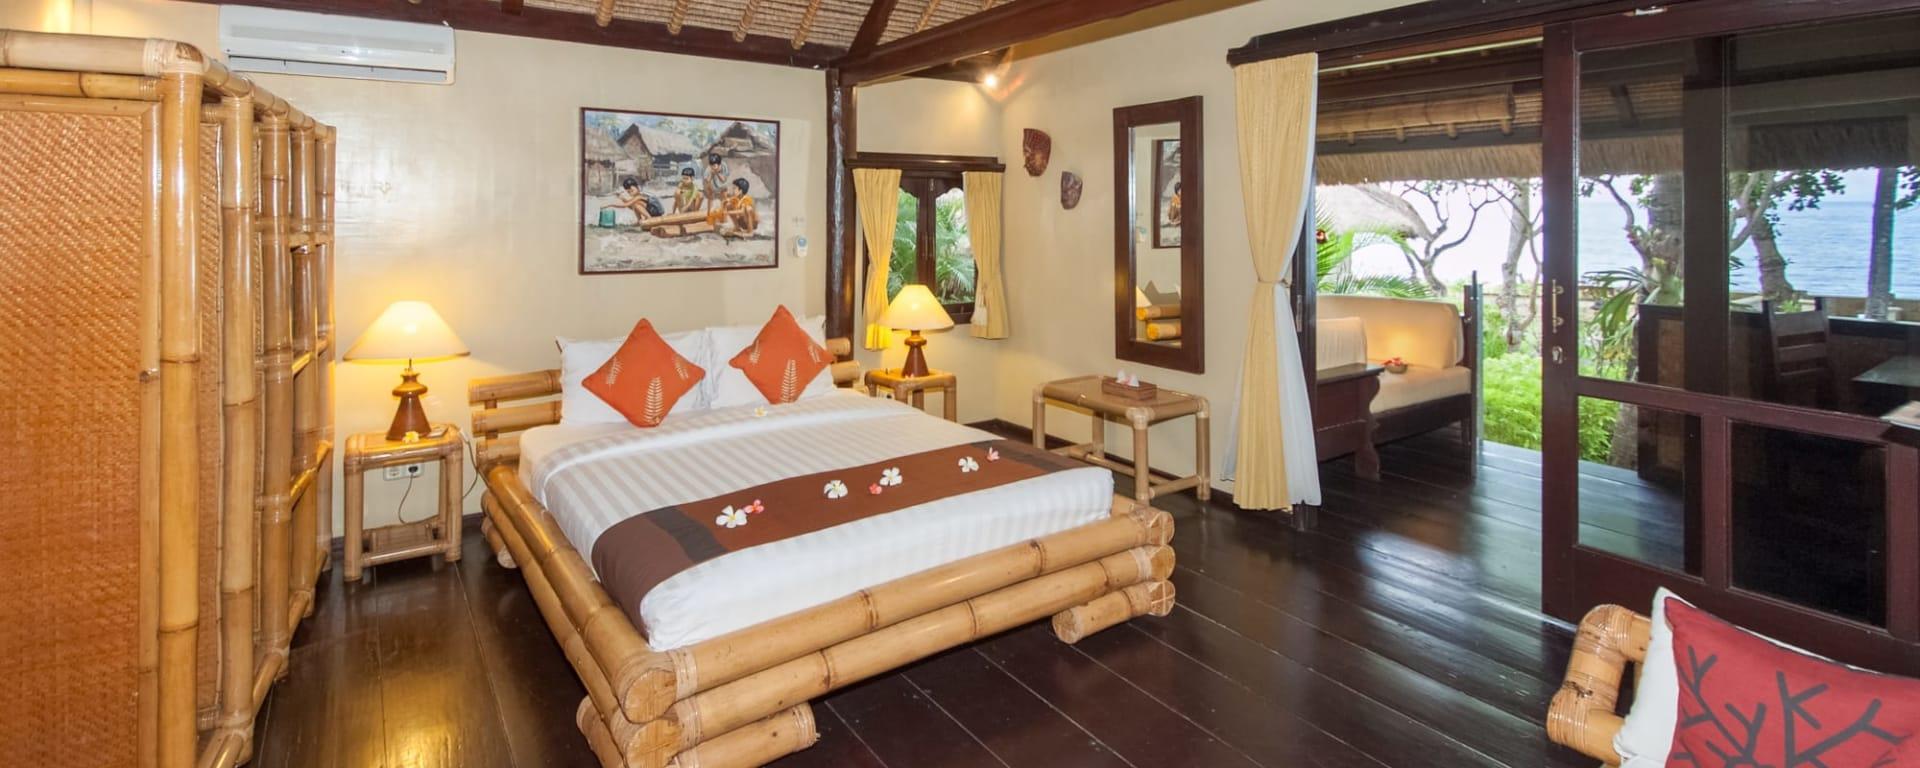 Alam Anda Ocean Front Resort & Spa in Ost-Bali | Sidemen: Alam Anda Ocean Front Resort and Spa Meerblick Zimmer